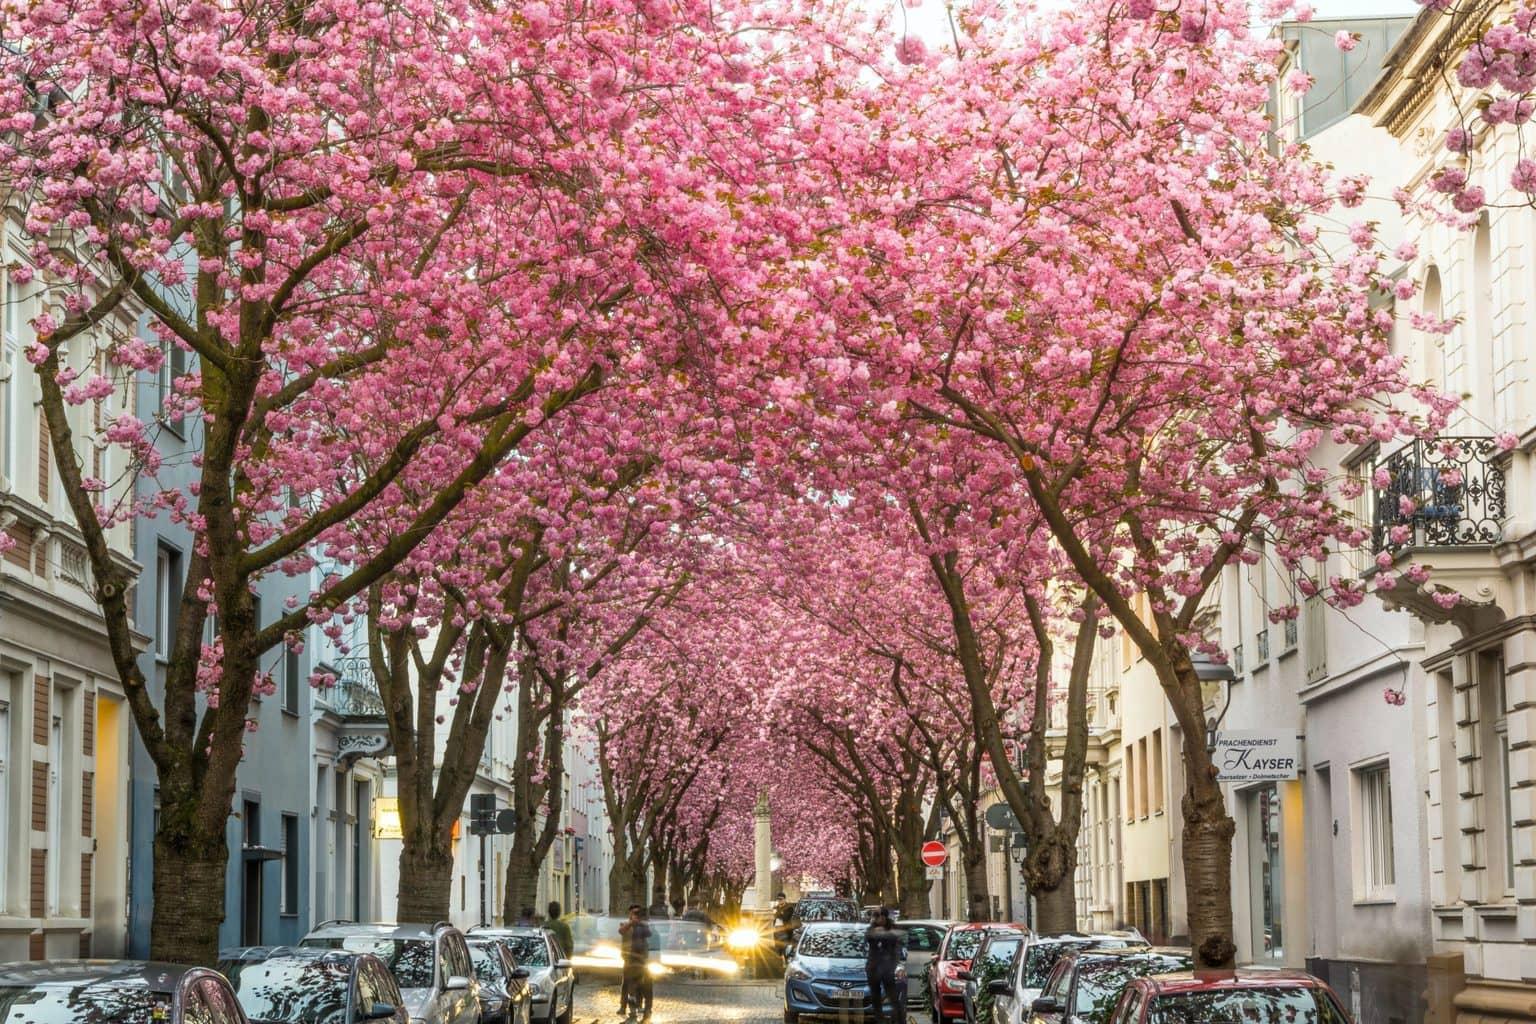 Kersenbomen bloeien in de oude stad van Bonn